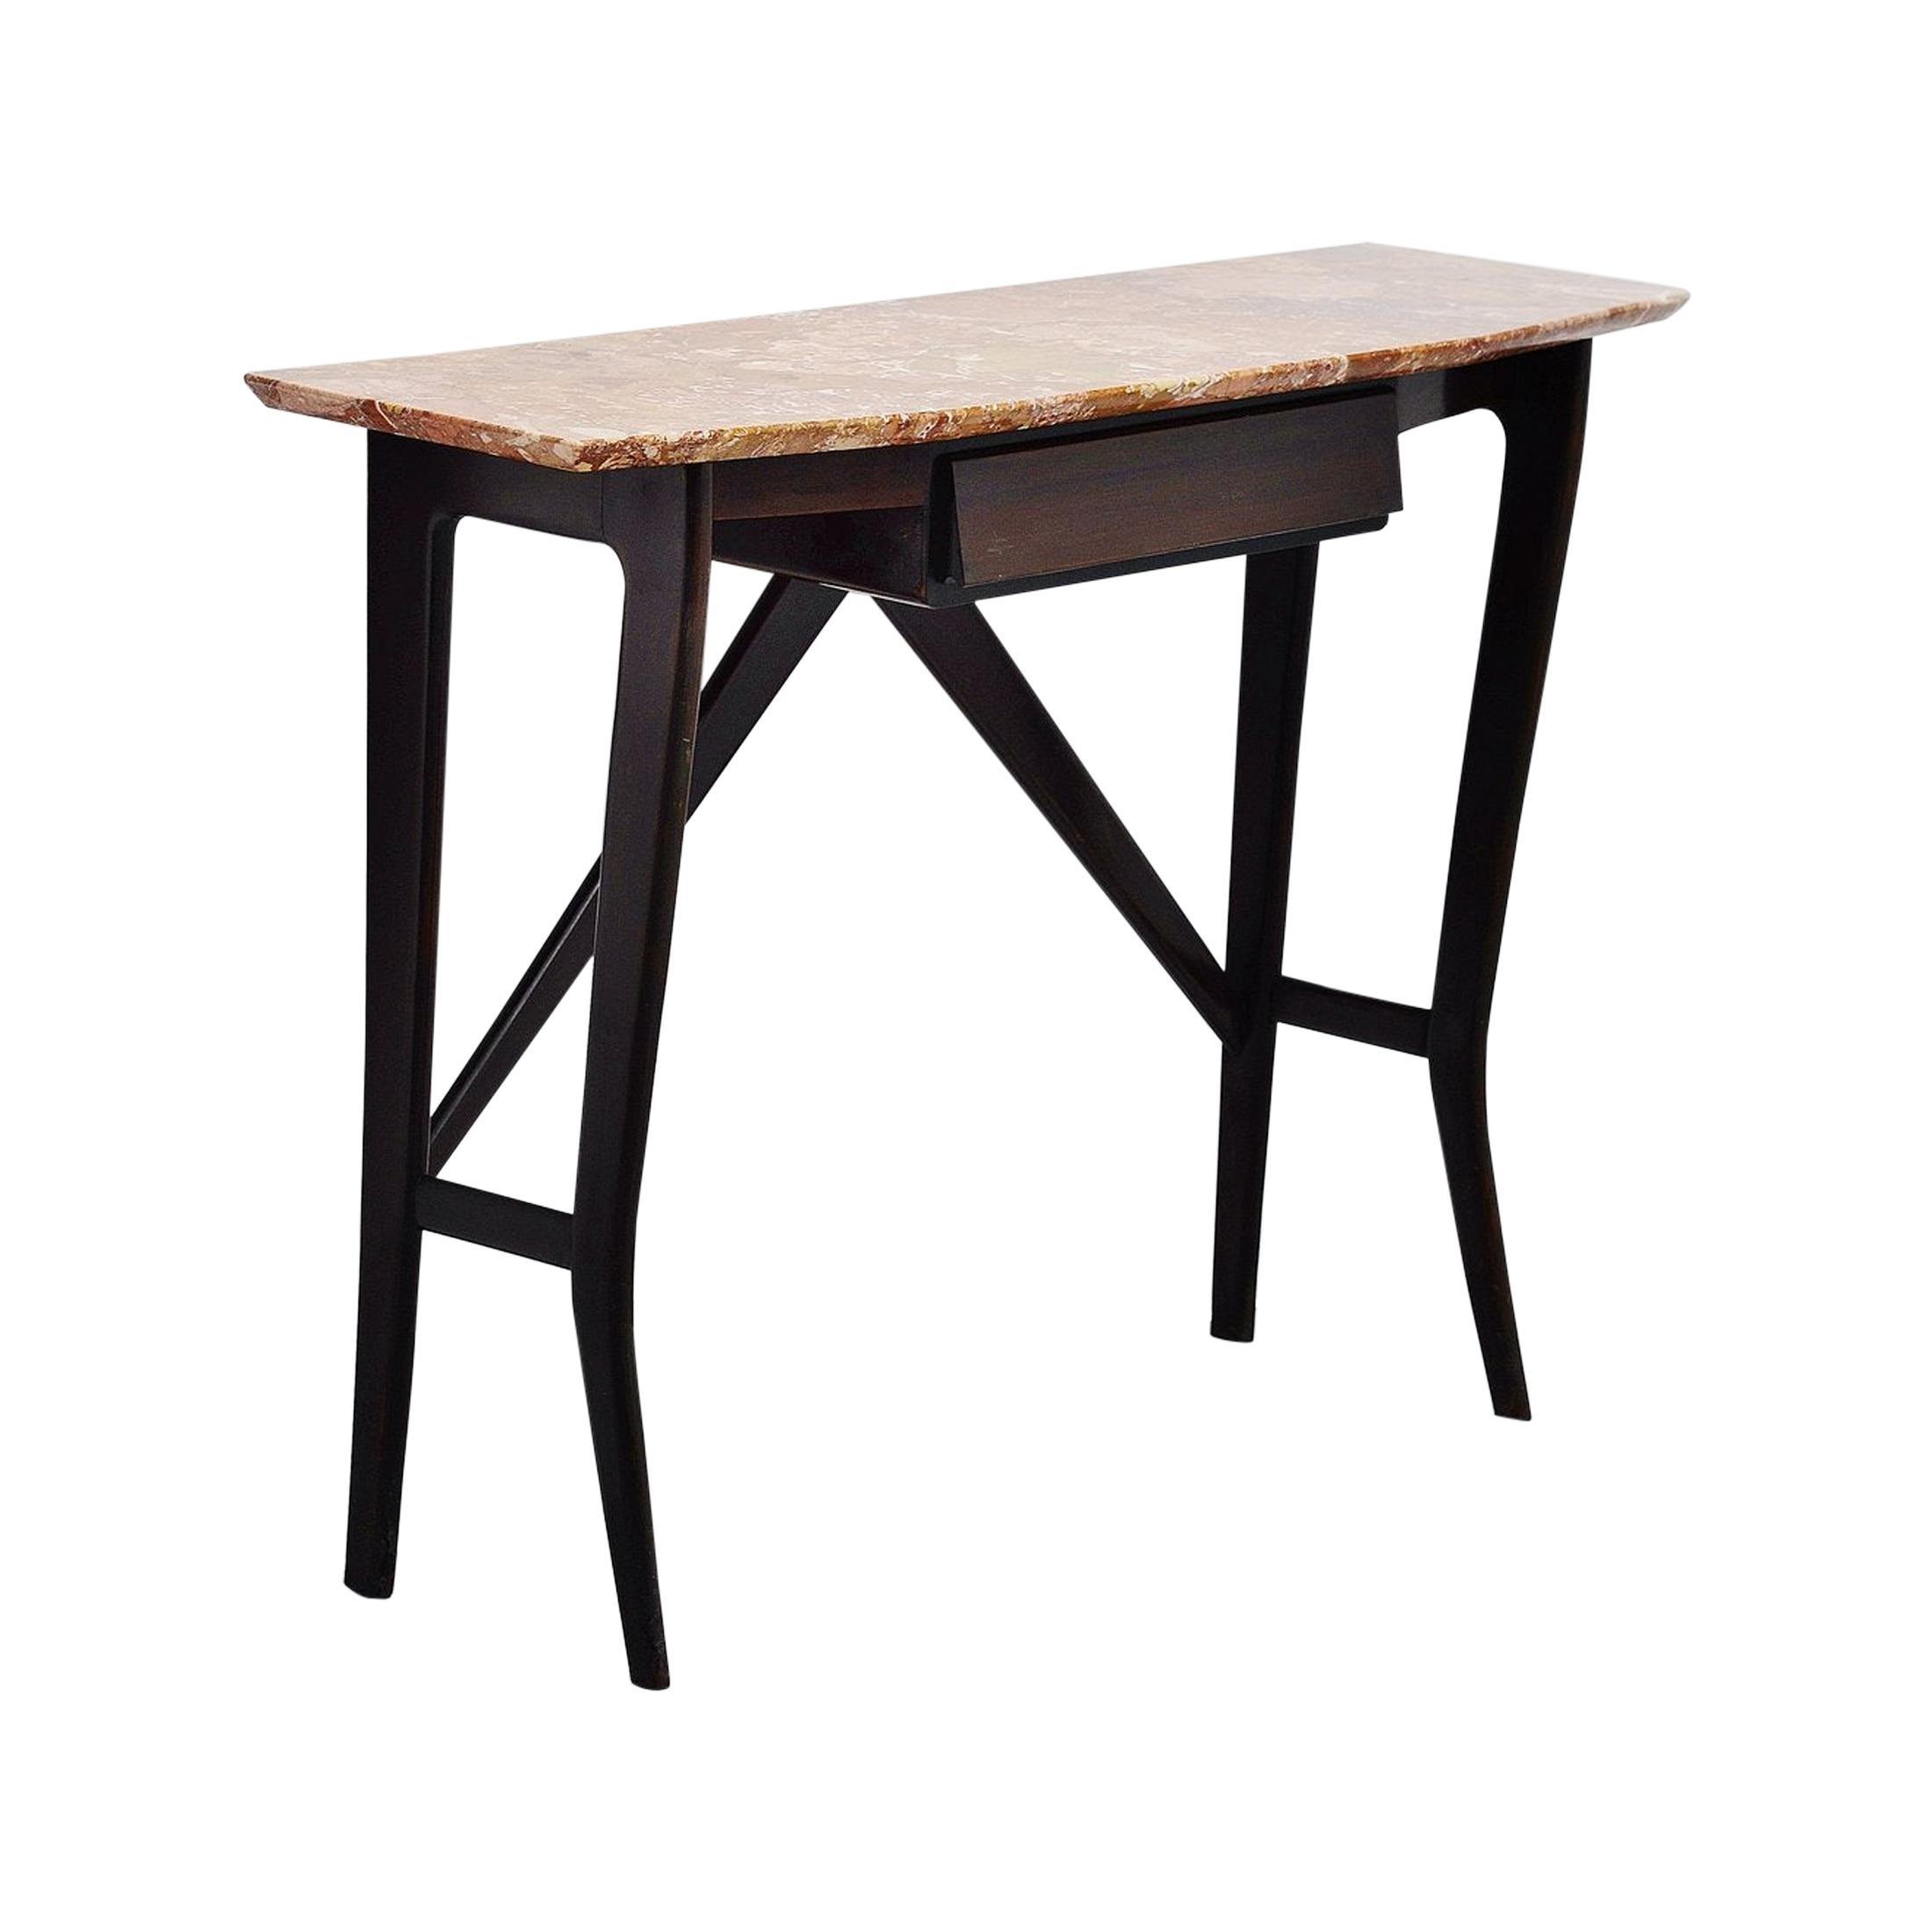 Italian Console Table Ico Parisi Style, Italy, 1950